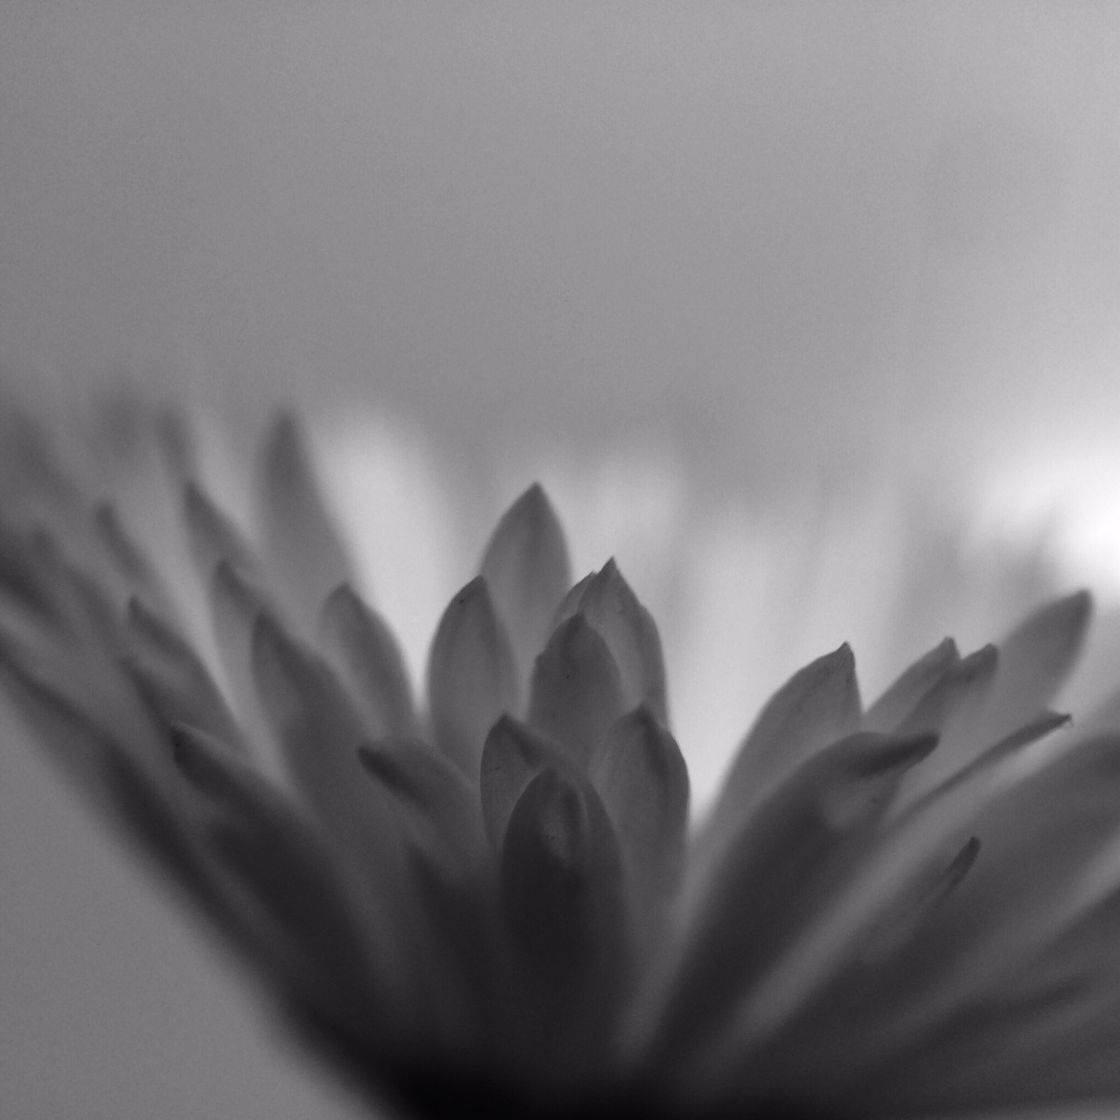 Minimalism Pihone Photography 13 no script